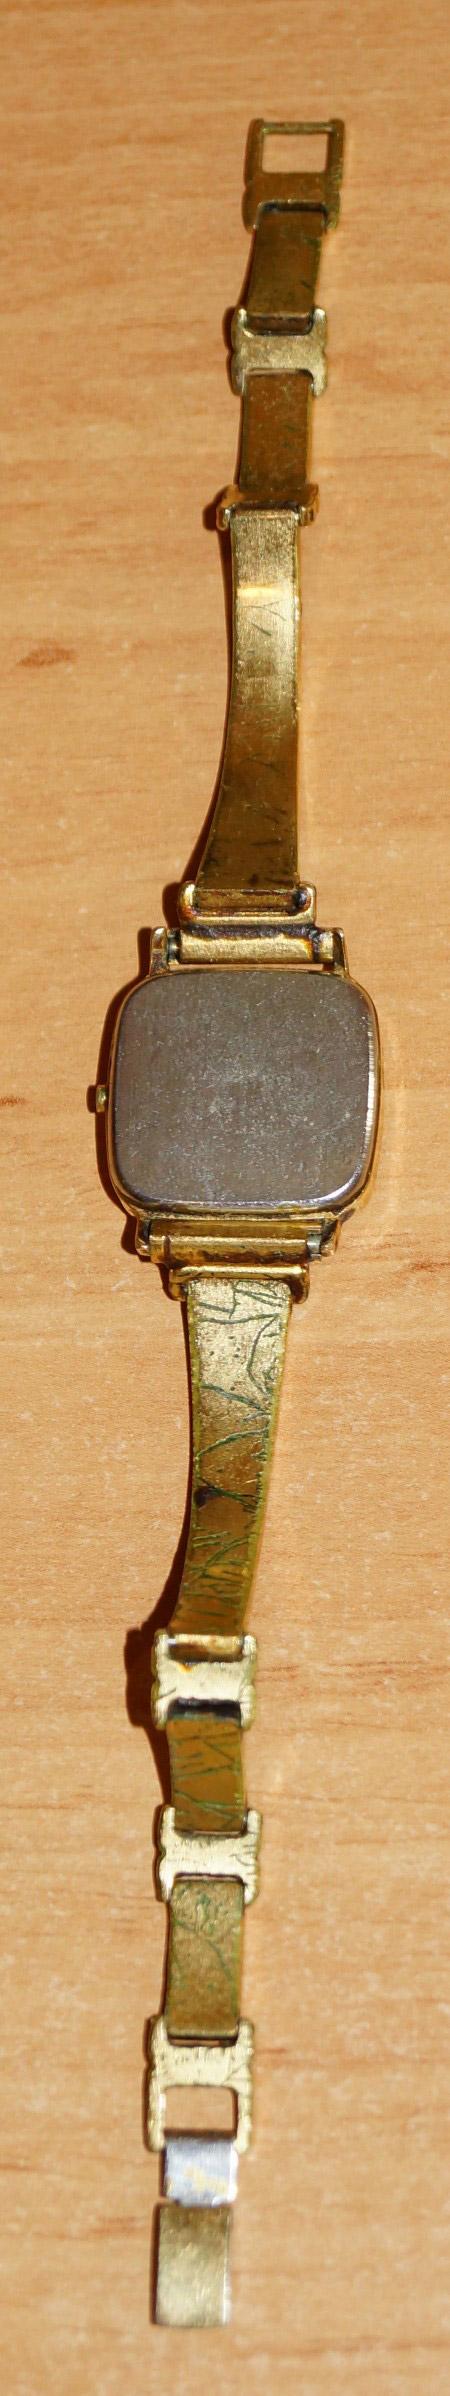 Tissot - Stylist - Damen - Armbanduhr - 1 - 1000.jpg